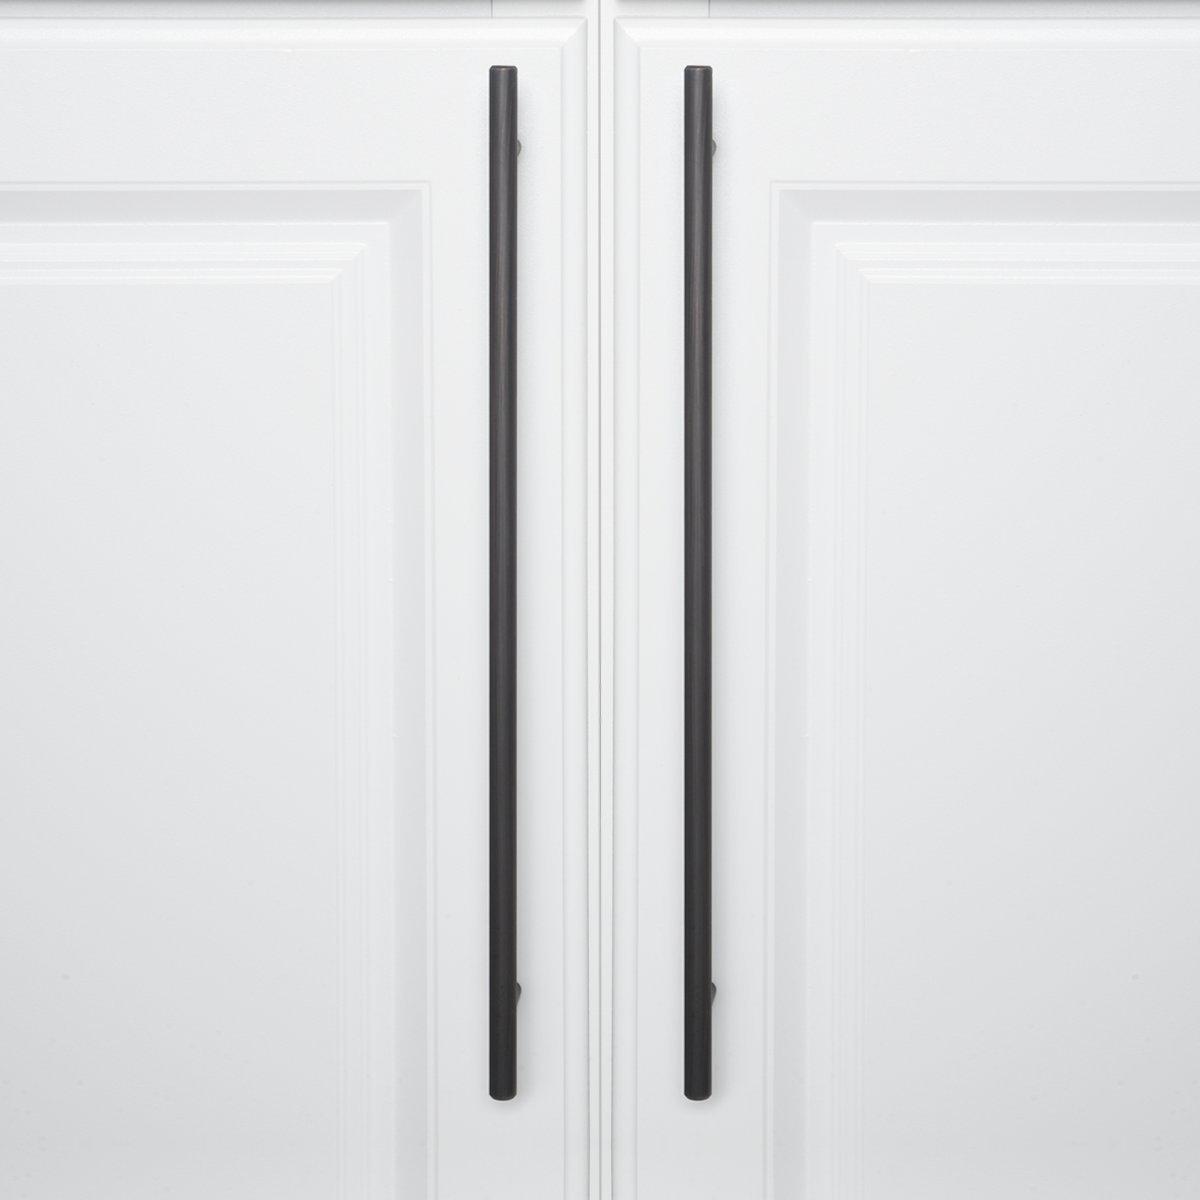 25-Pack Basics Euro Bar Cabinet Handle 3//8 Diameter 5.38 Length 3 Hole Center Satin Nickel